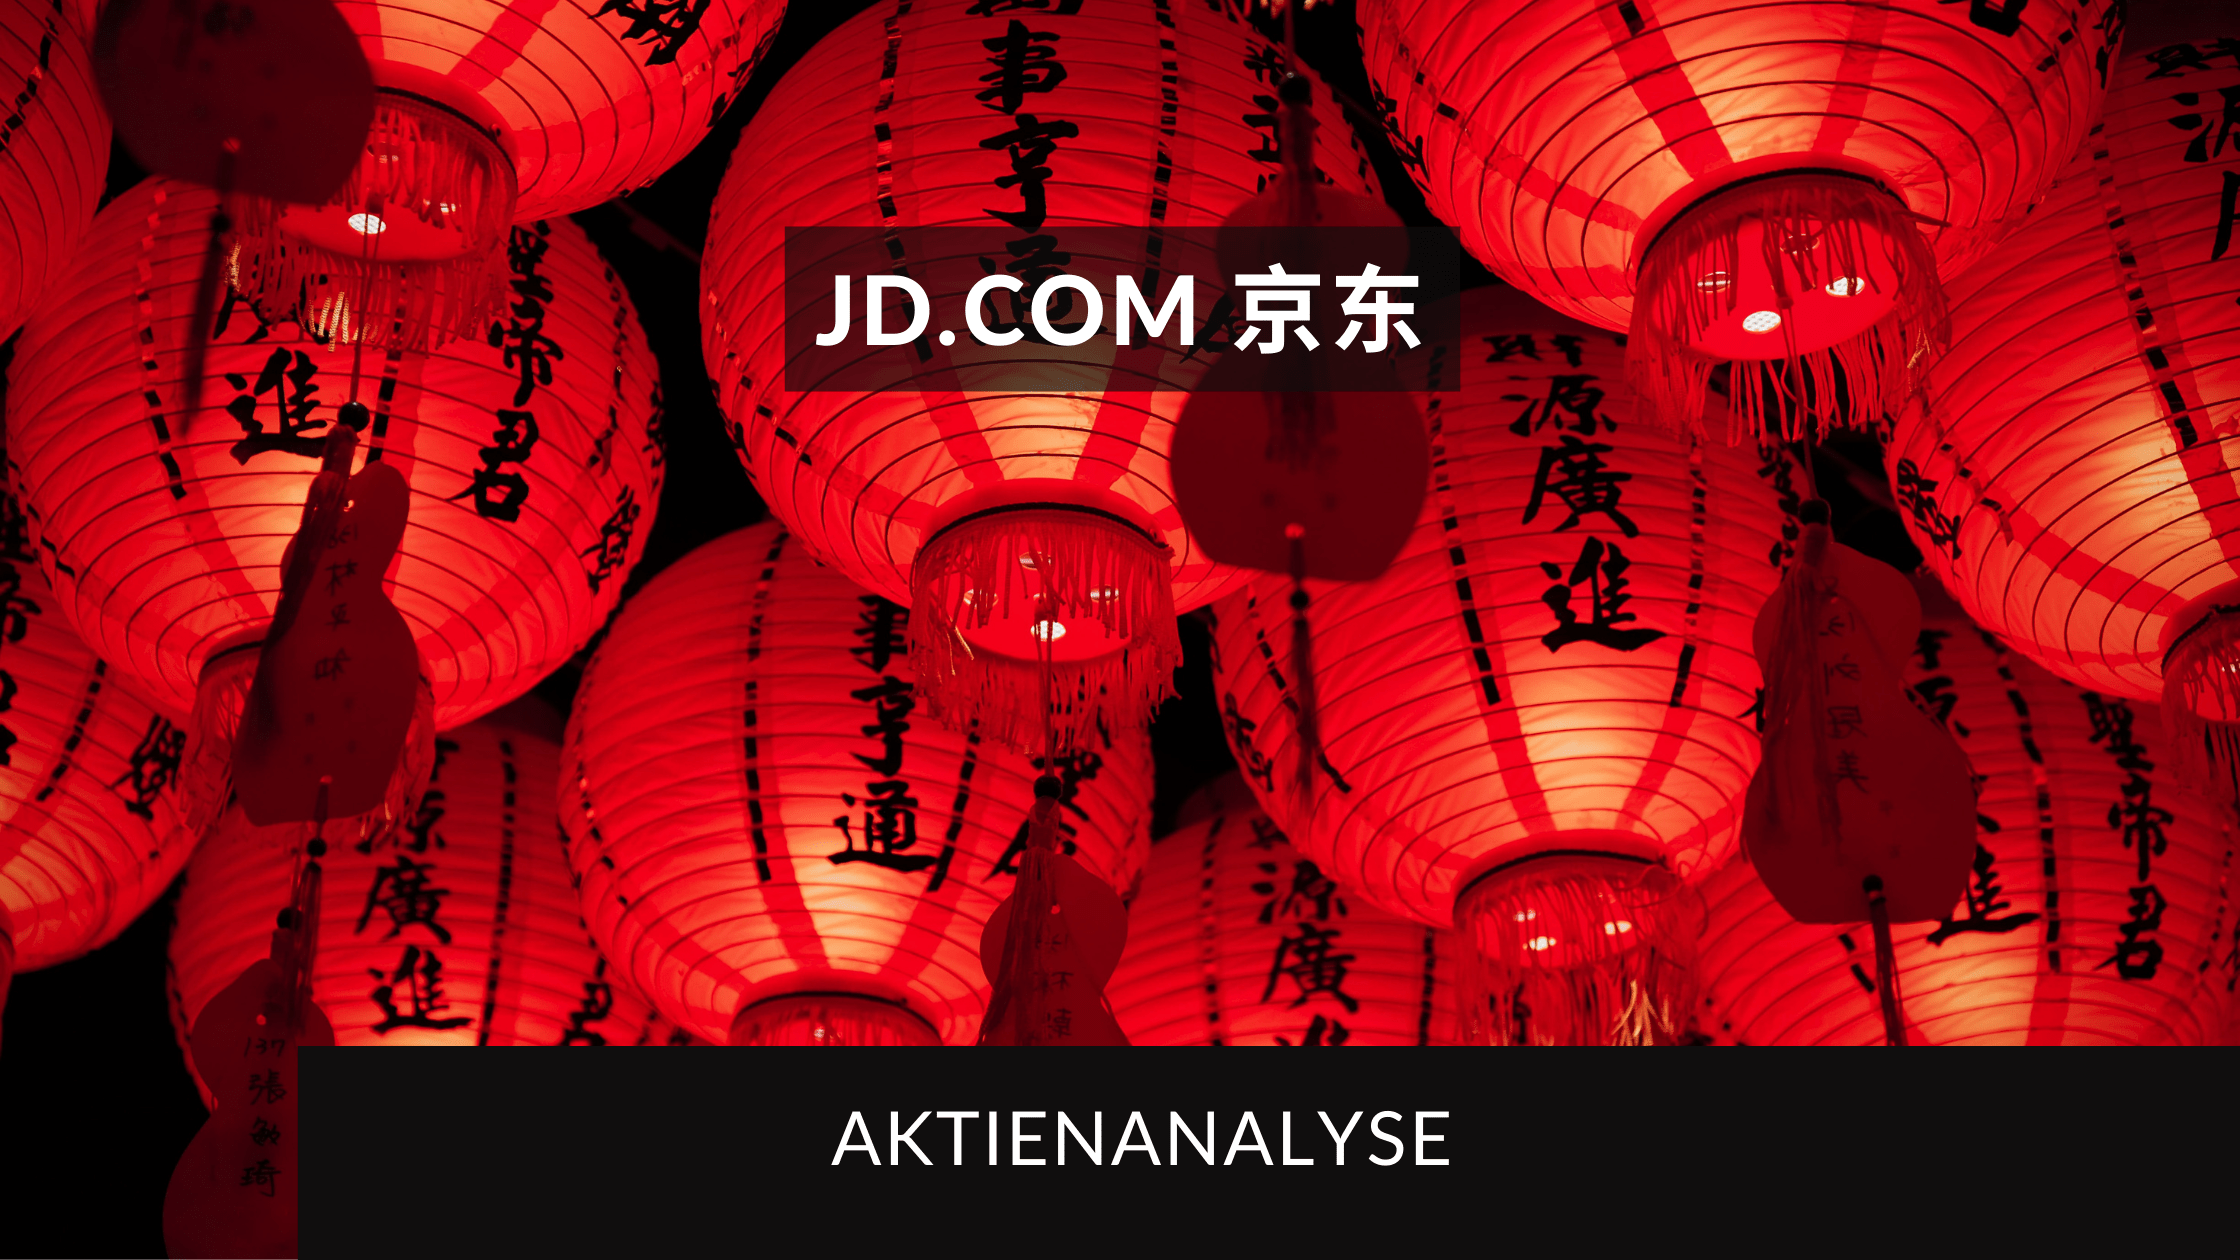 JD.com Aktienanalyse